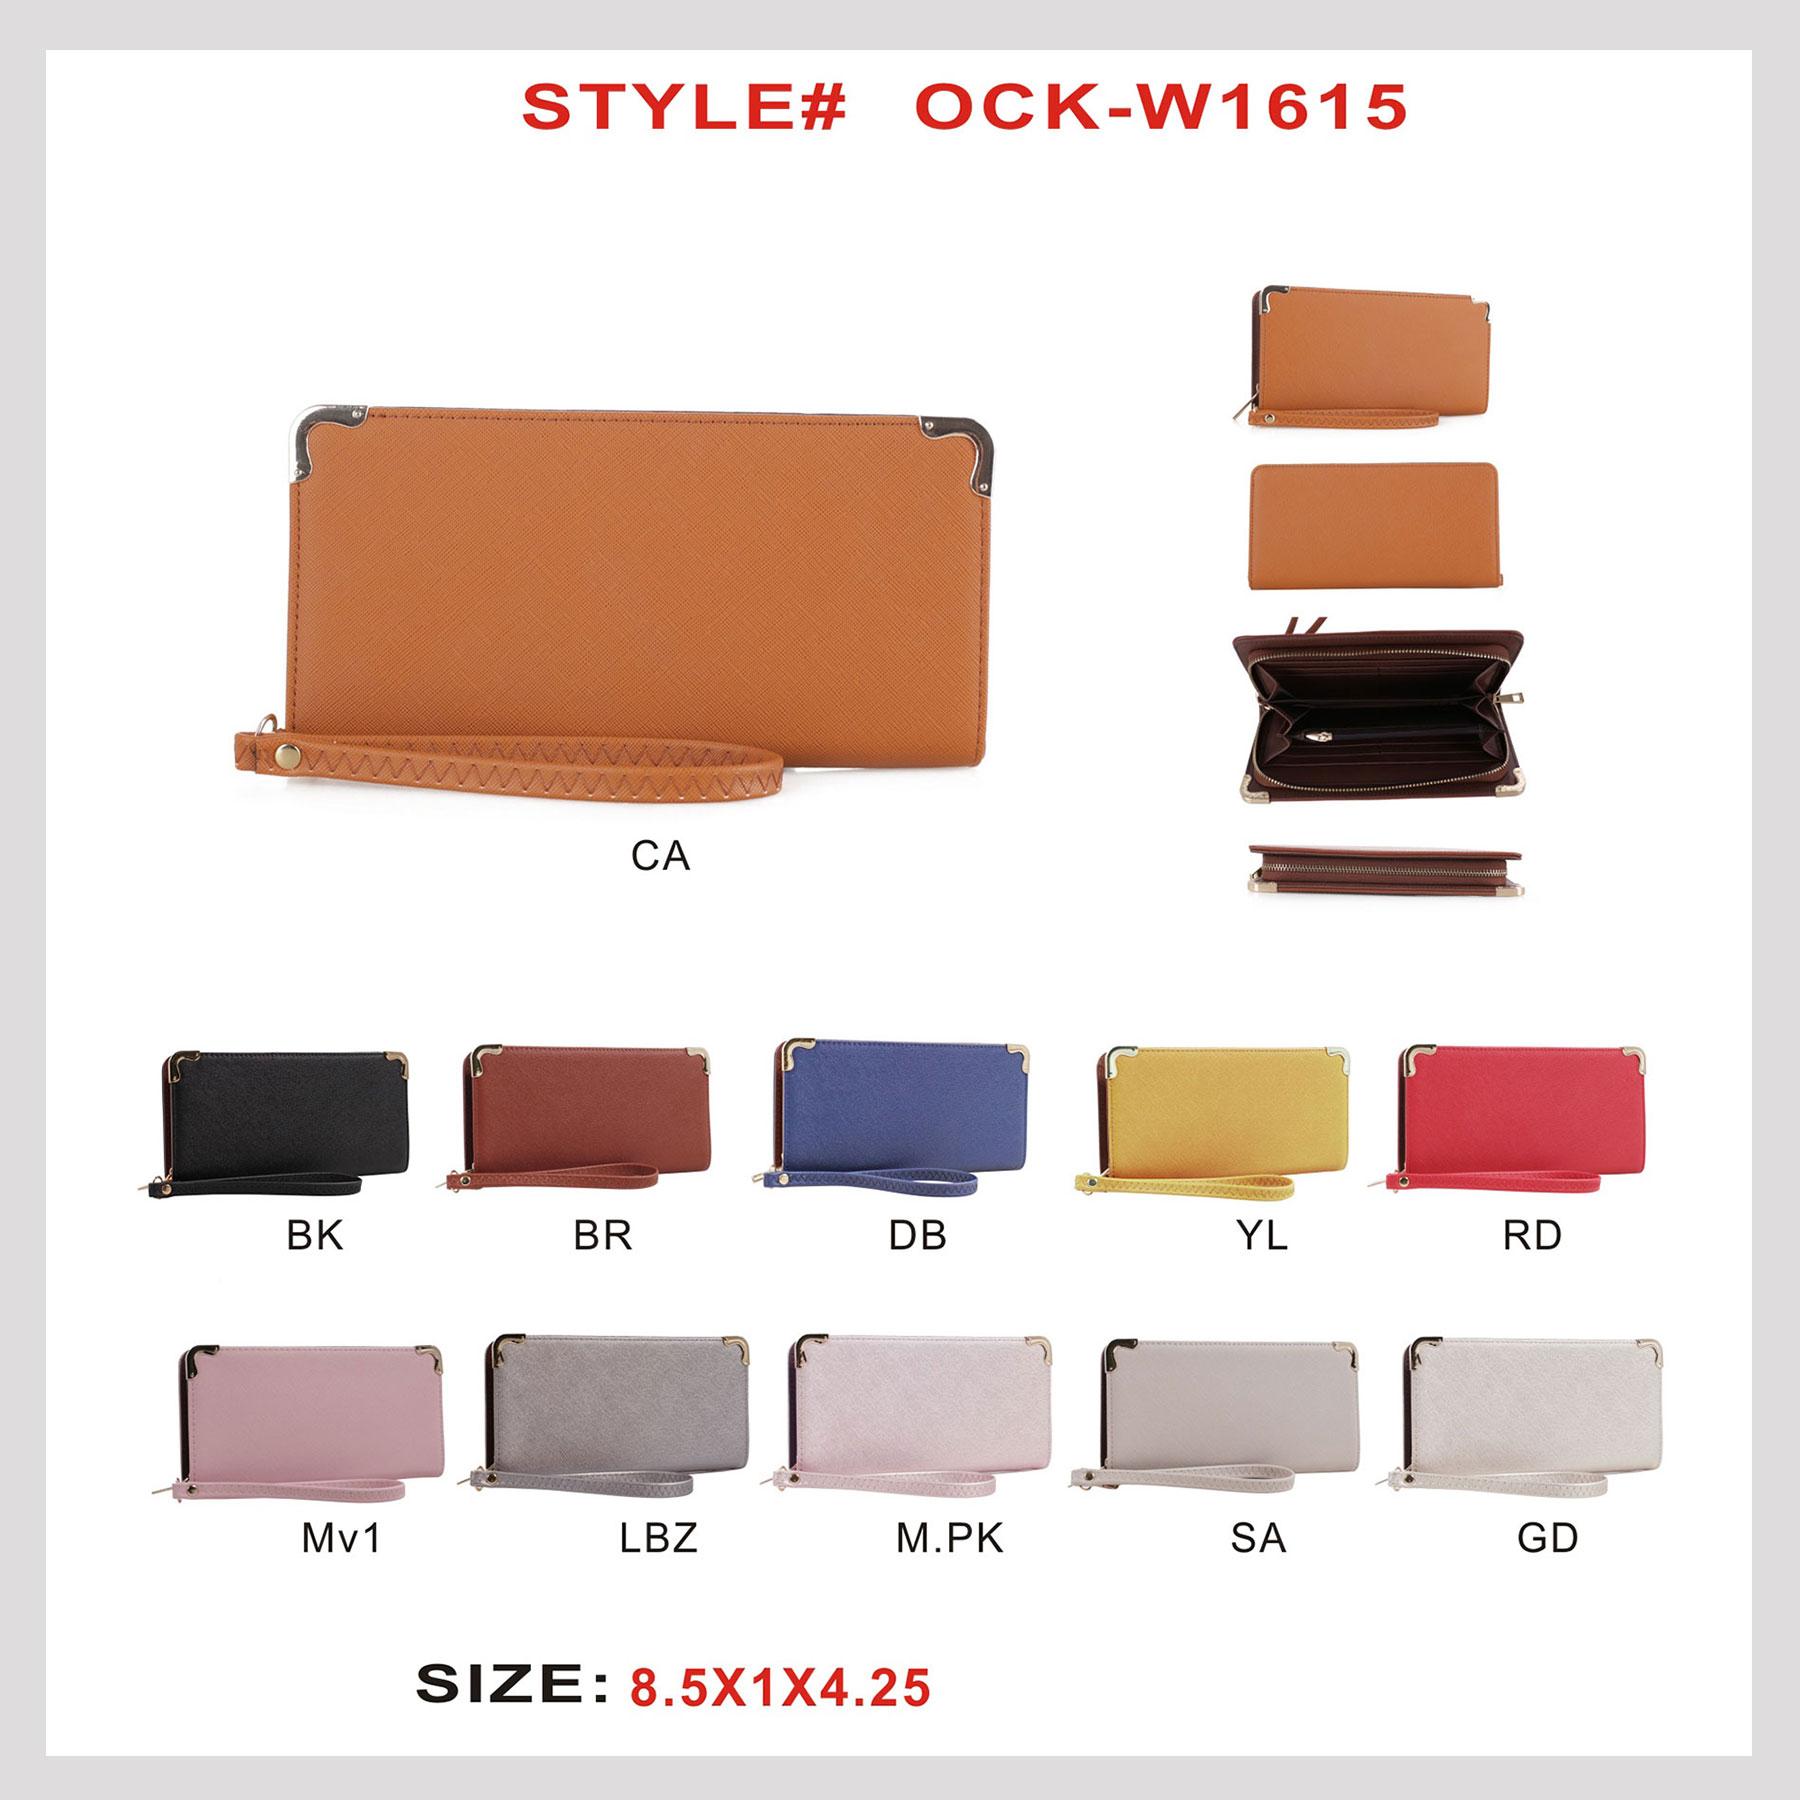 OCK-W1615.jpg